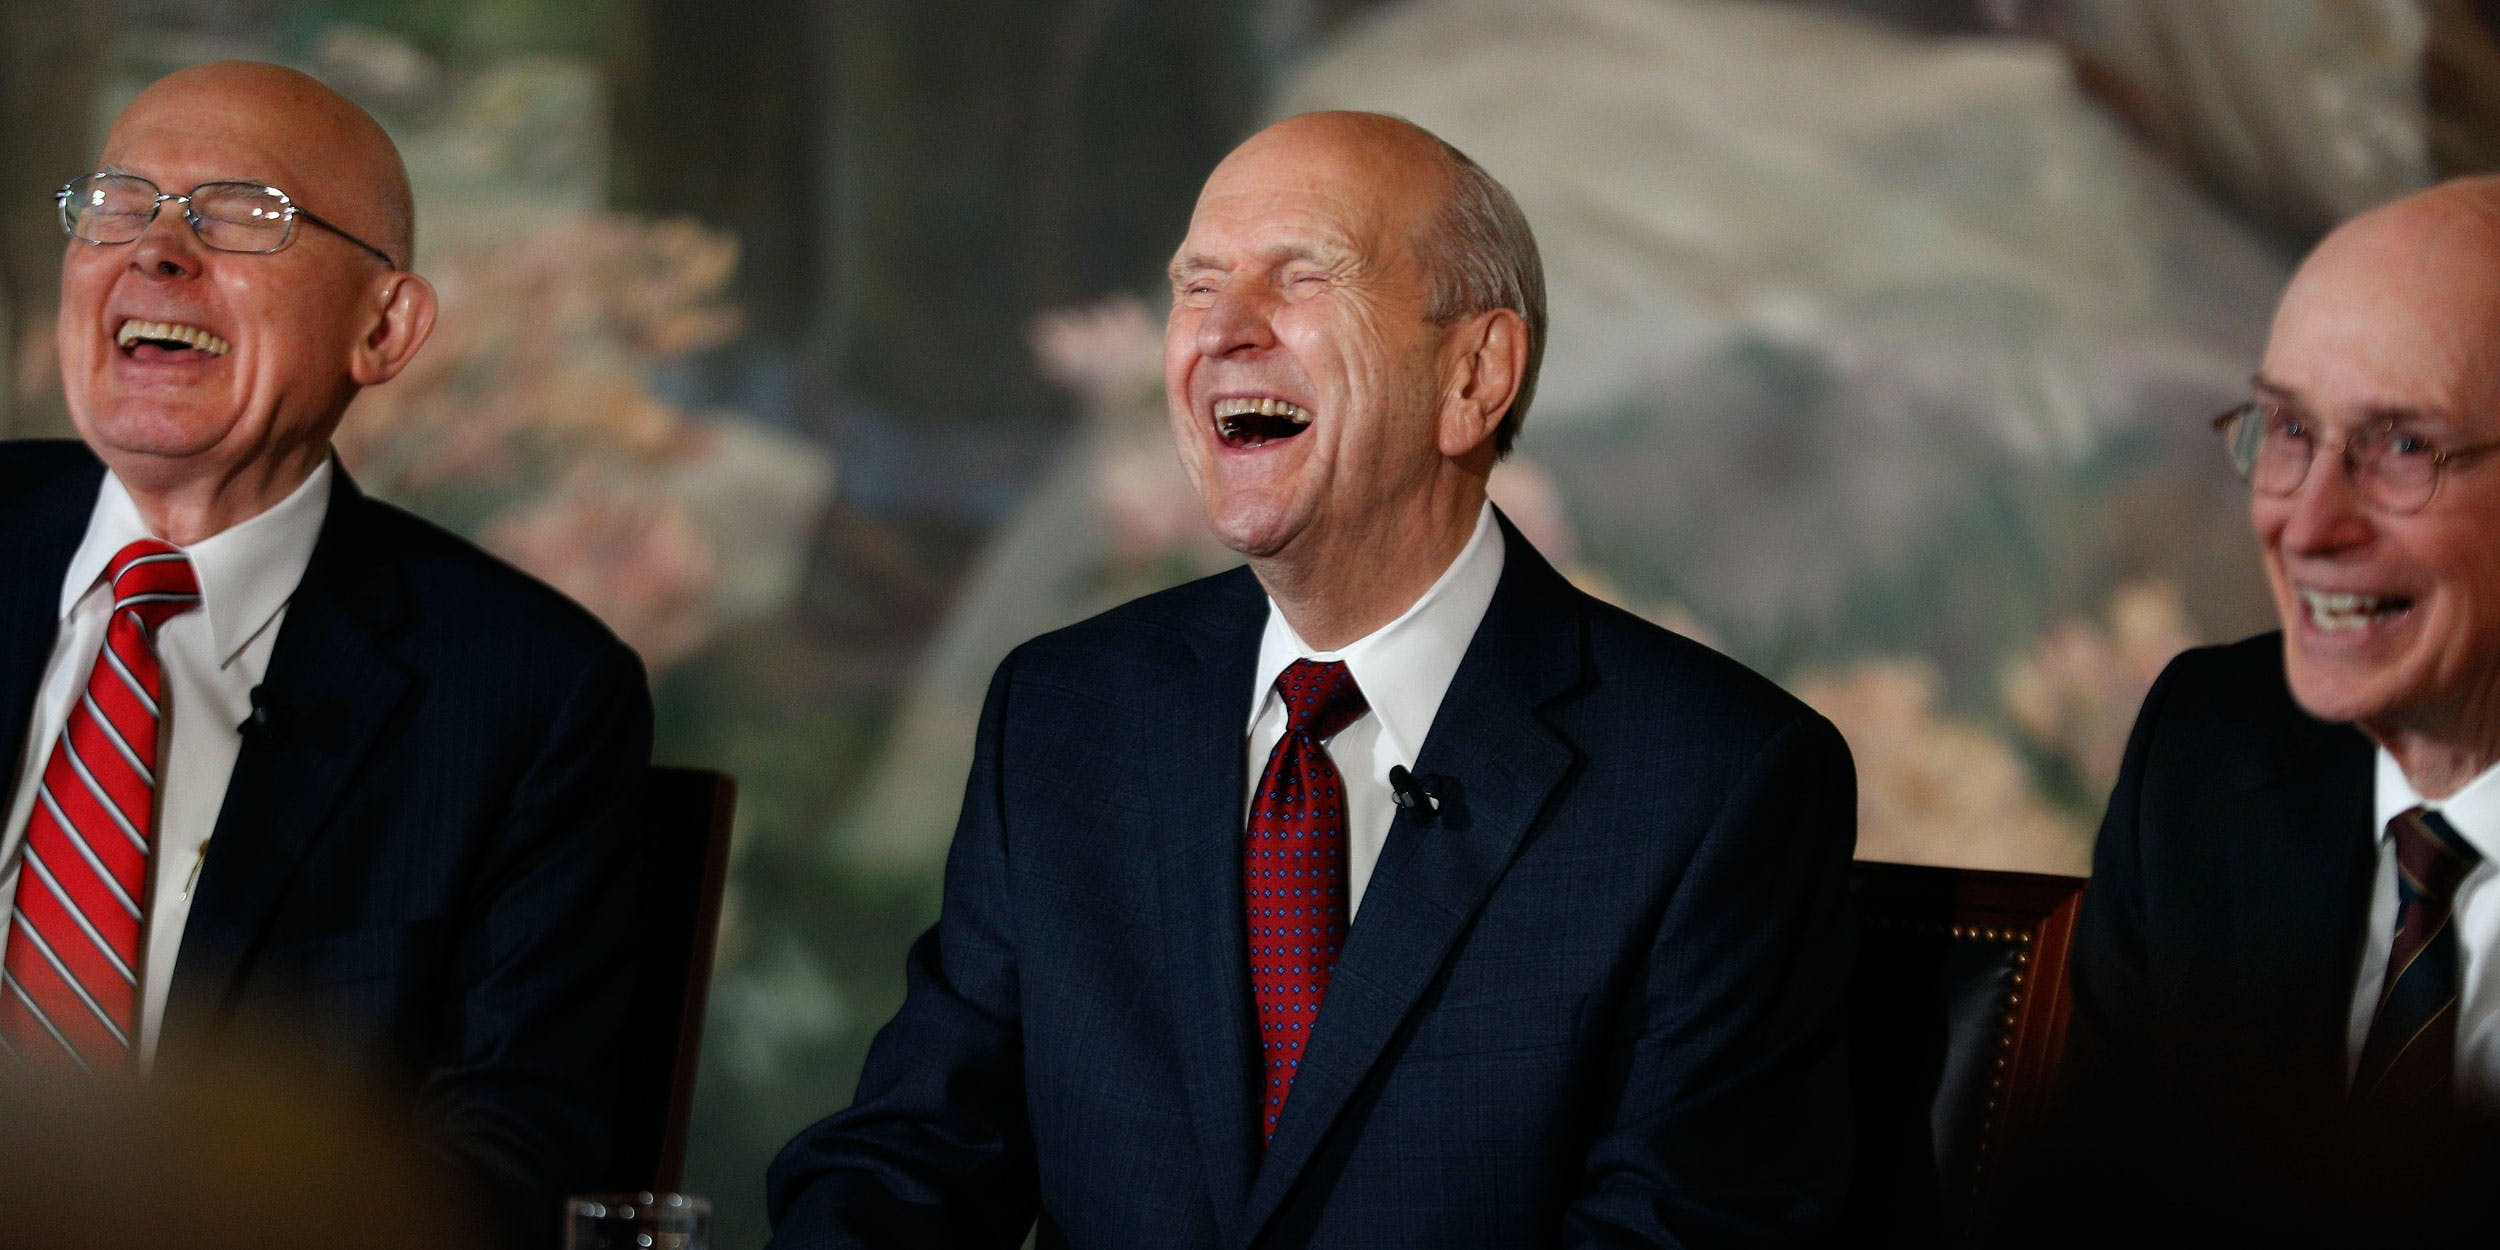 Mormon Church Opposing Utah Medical Marijuana and cannabis Initiative Owns $1 Billion Worth of Big Pharma Stocks